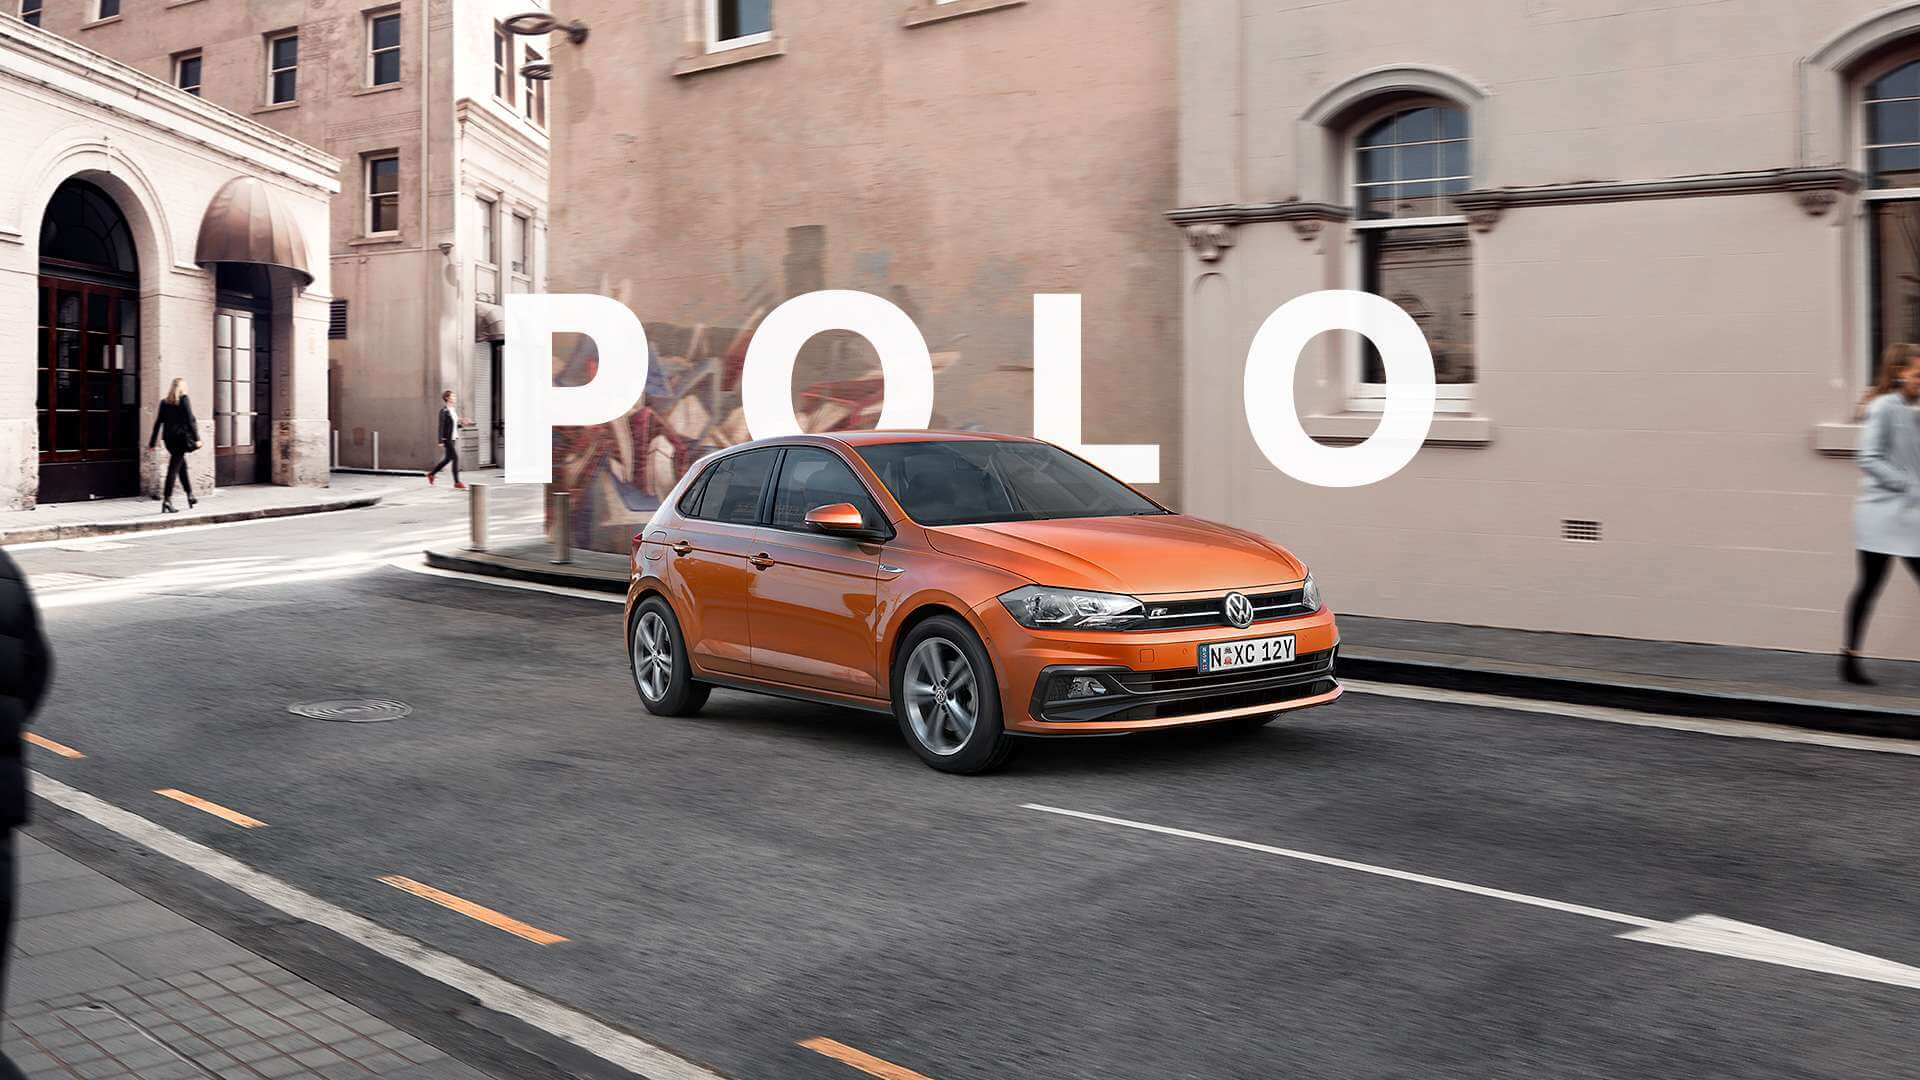 Polo Confidently stylish.